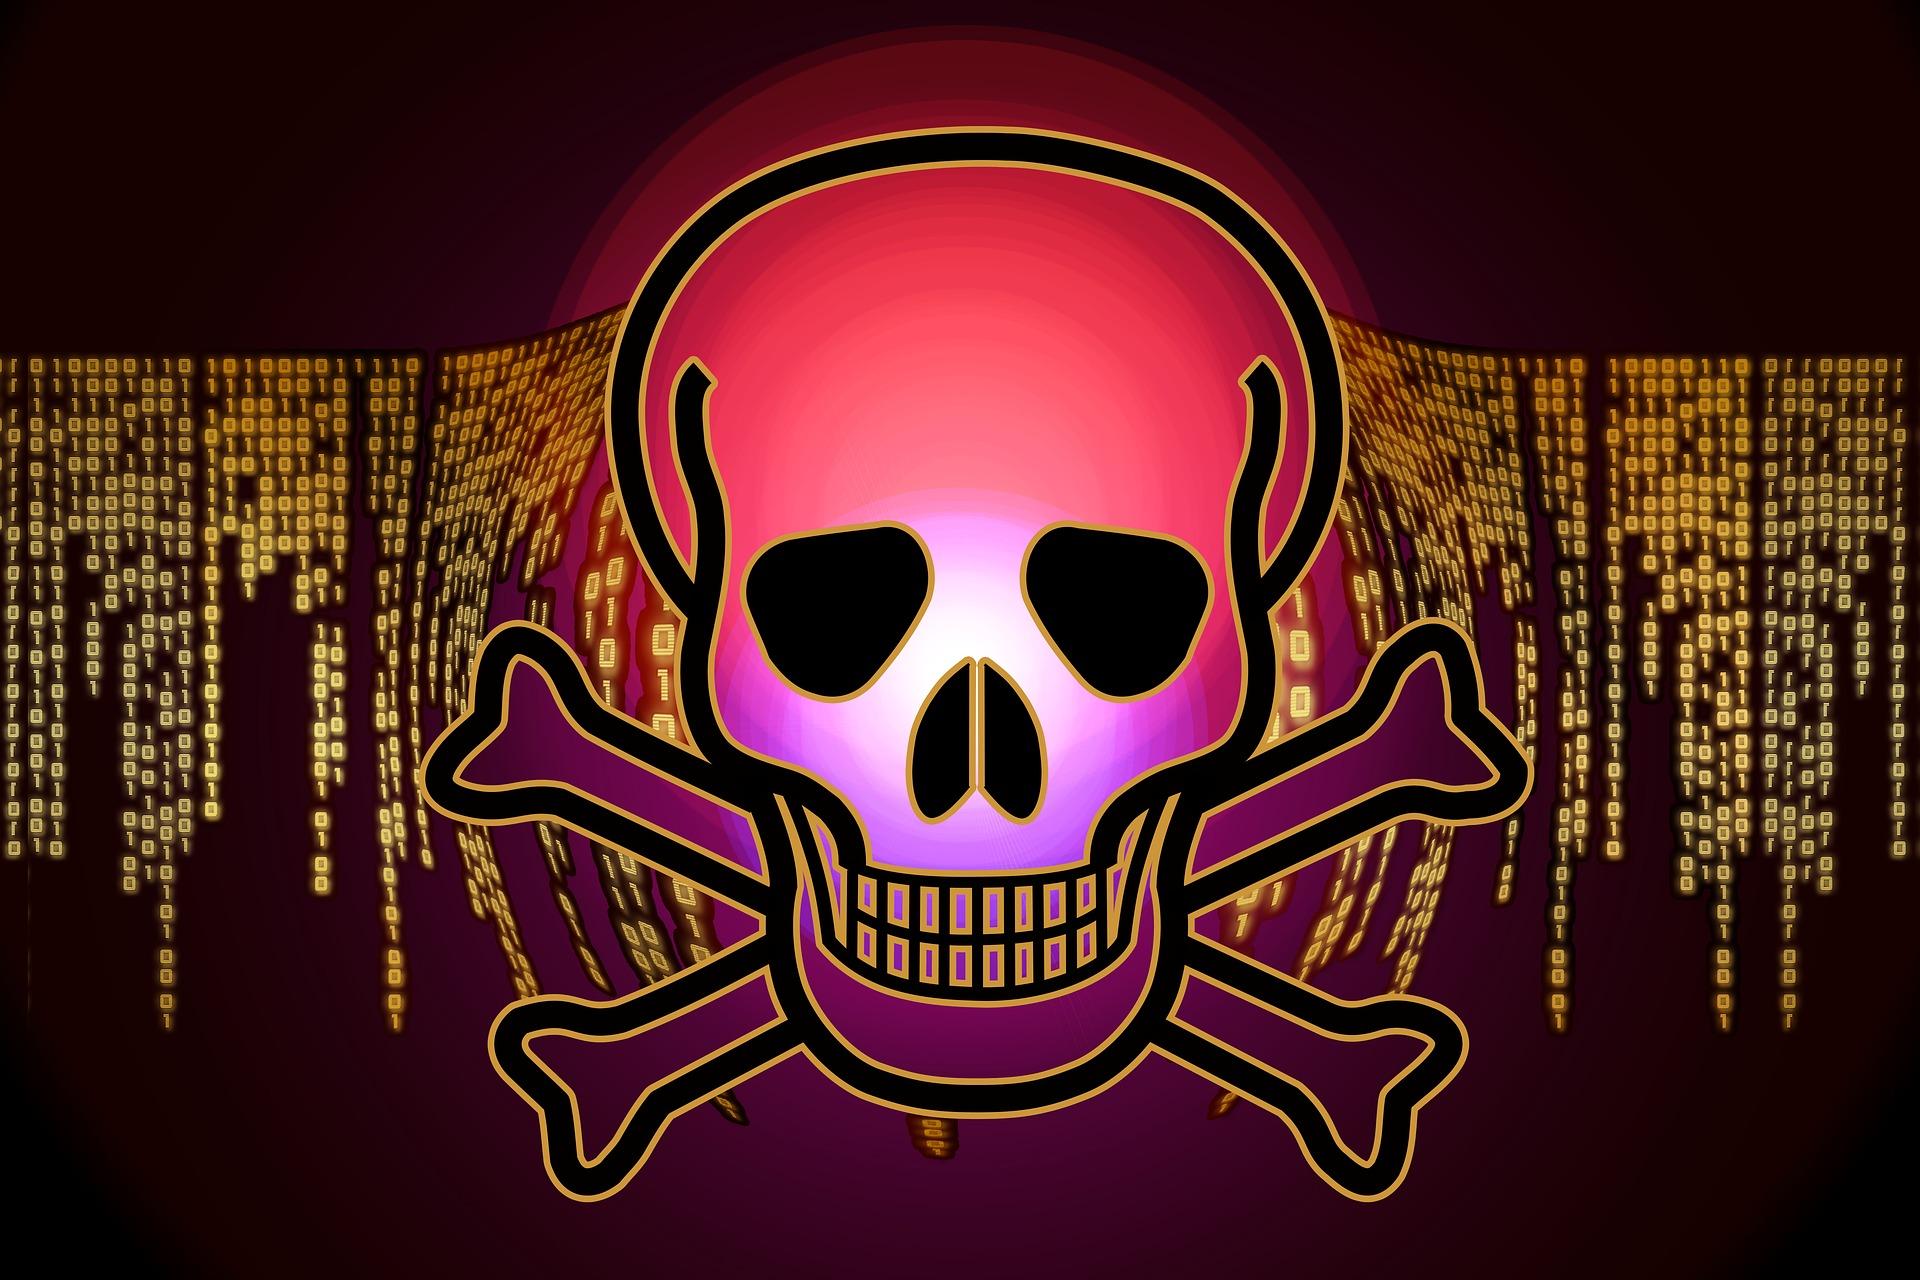 malware goldeneye